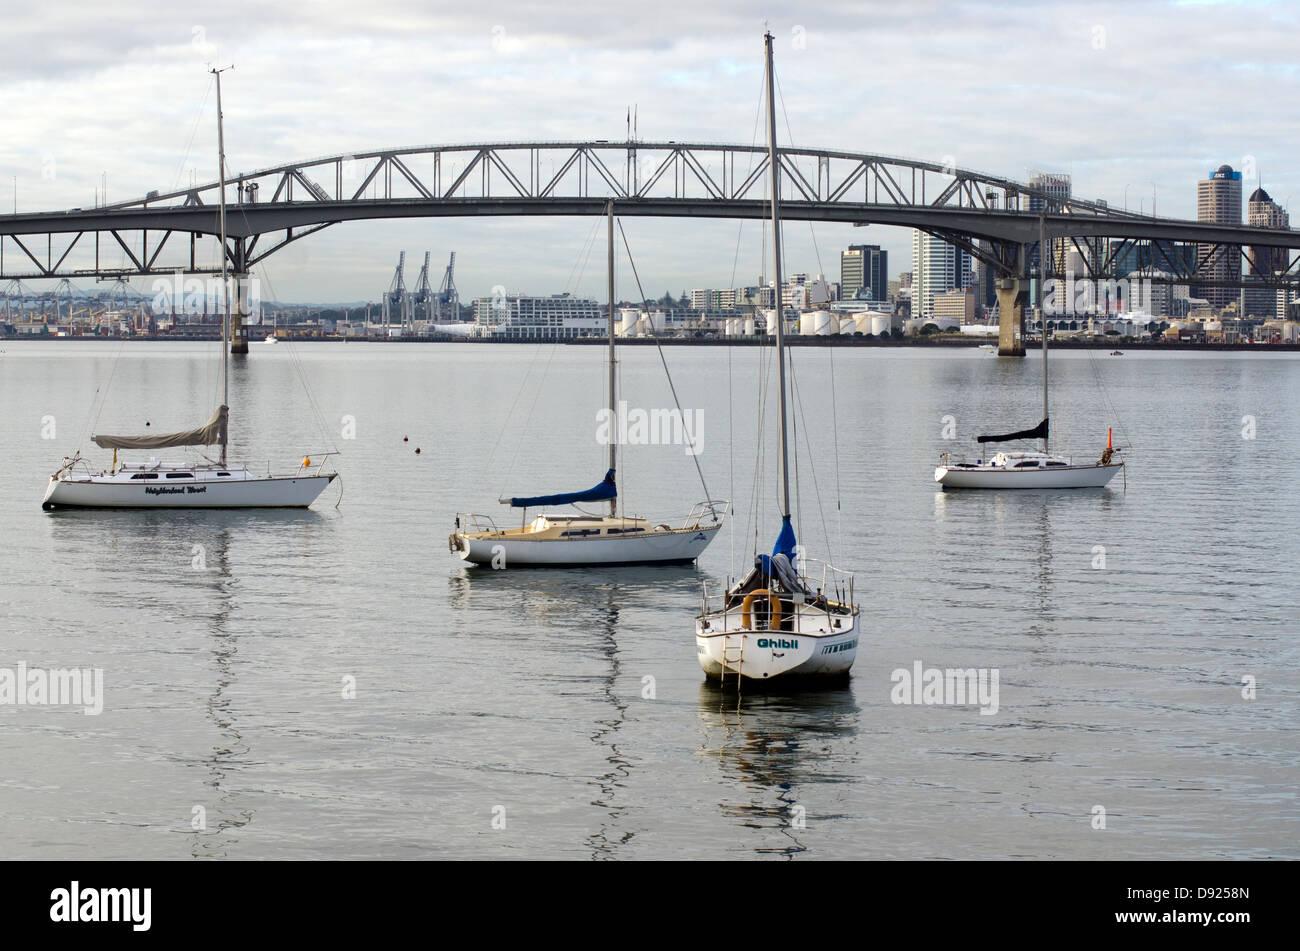 Boats mooring near Auckland Harbour Bridge - Stock Image